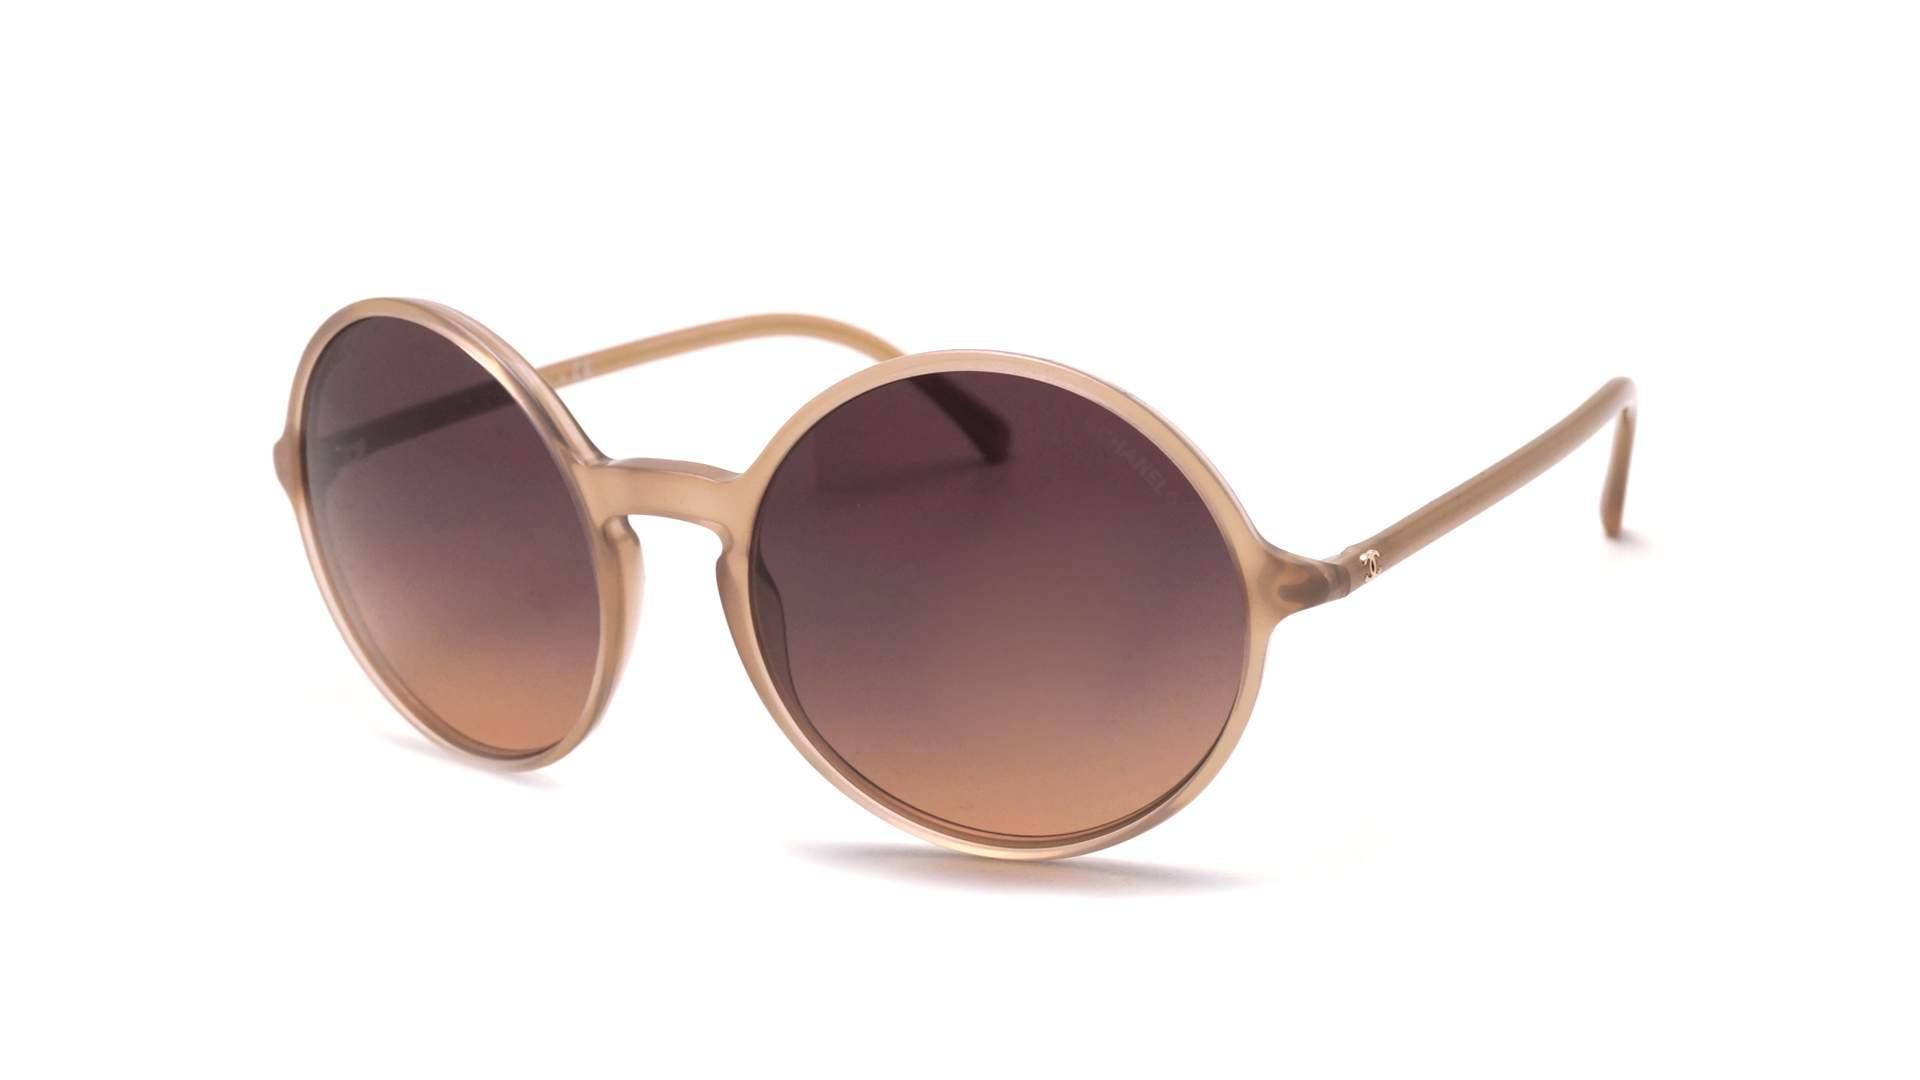 31d8c254f6dda4 Sunglasses Chanel Signature Pink CH5279 1623/K0 55-19 Medium Gradient